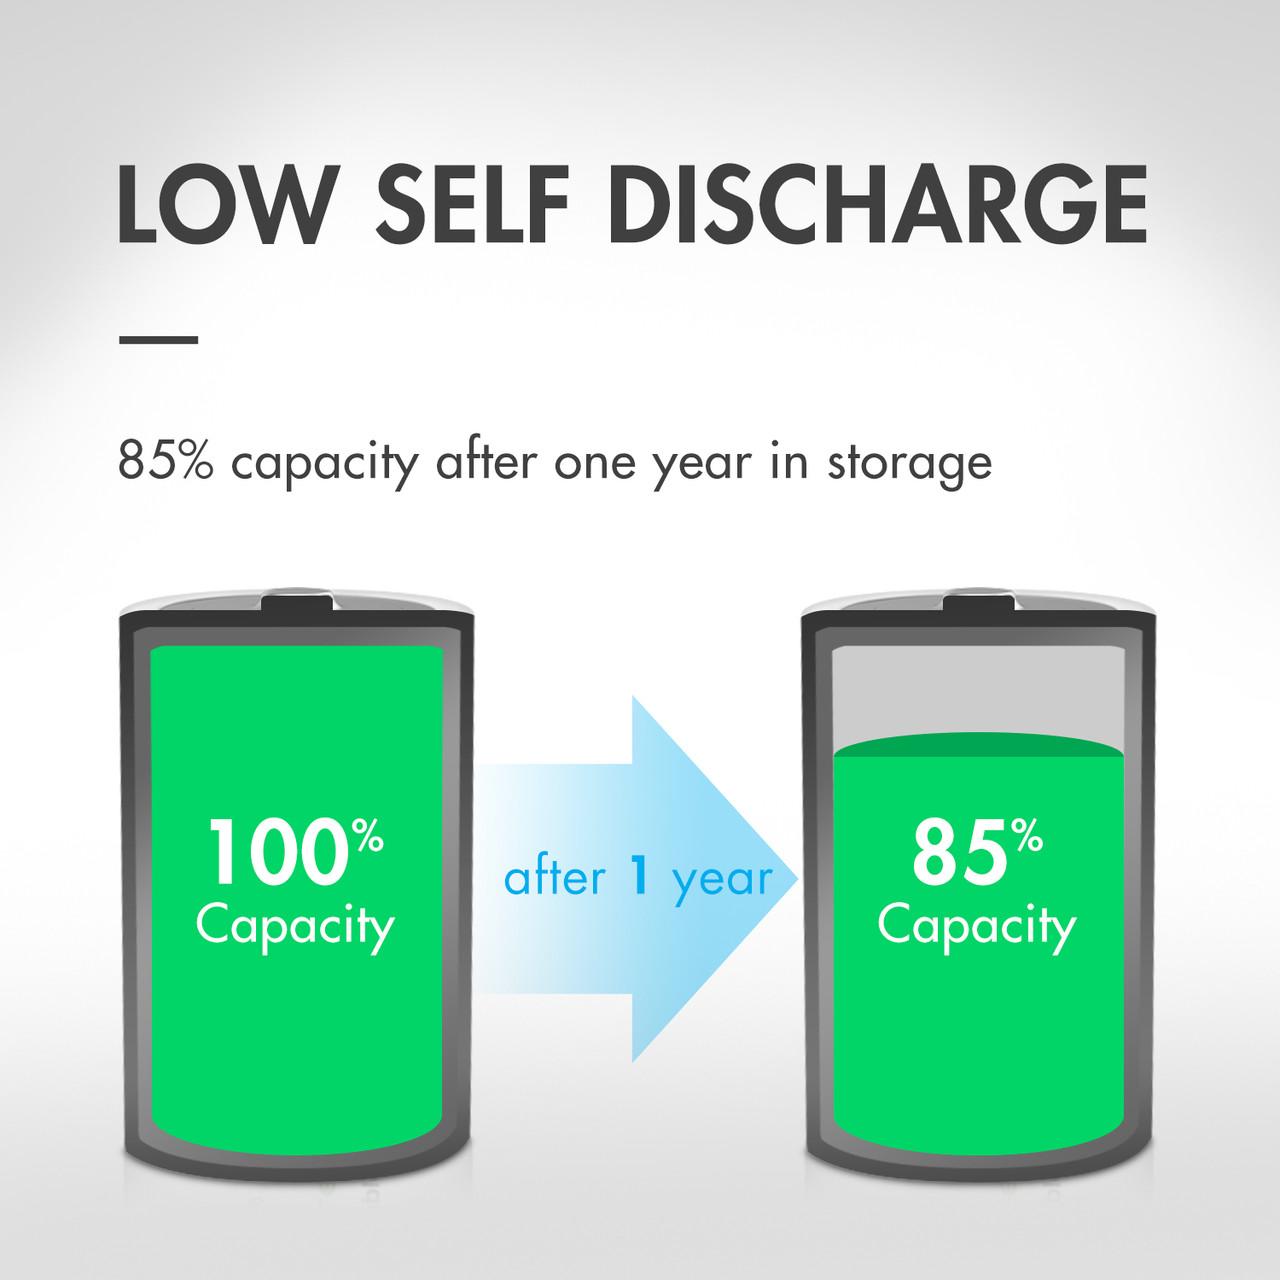 8-pack (4 x Card) Tenergy Centura NiMH D 1.2V 8000mAh Rechargeable Batteries